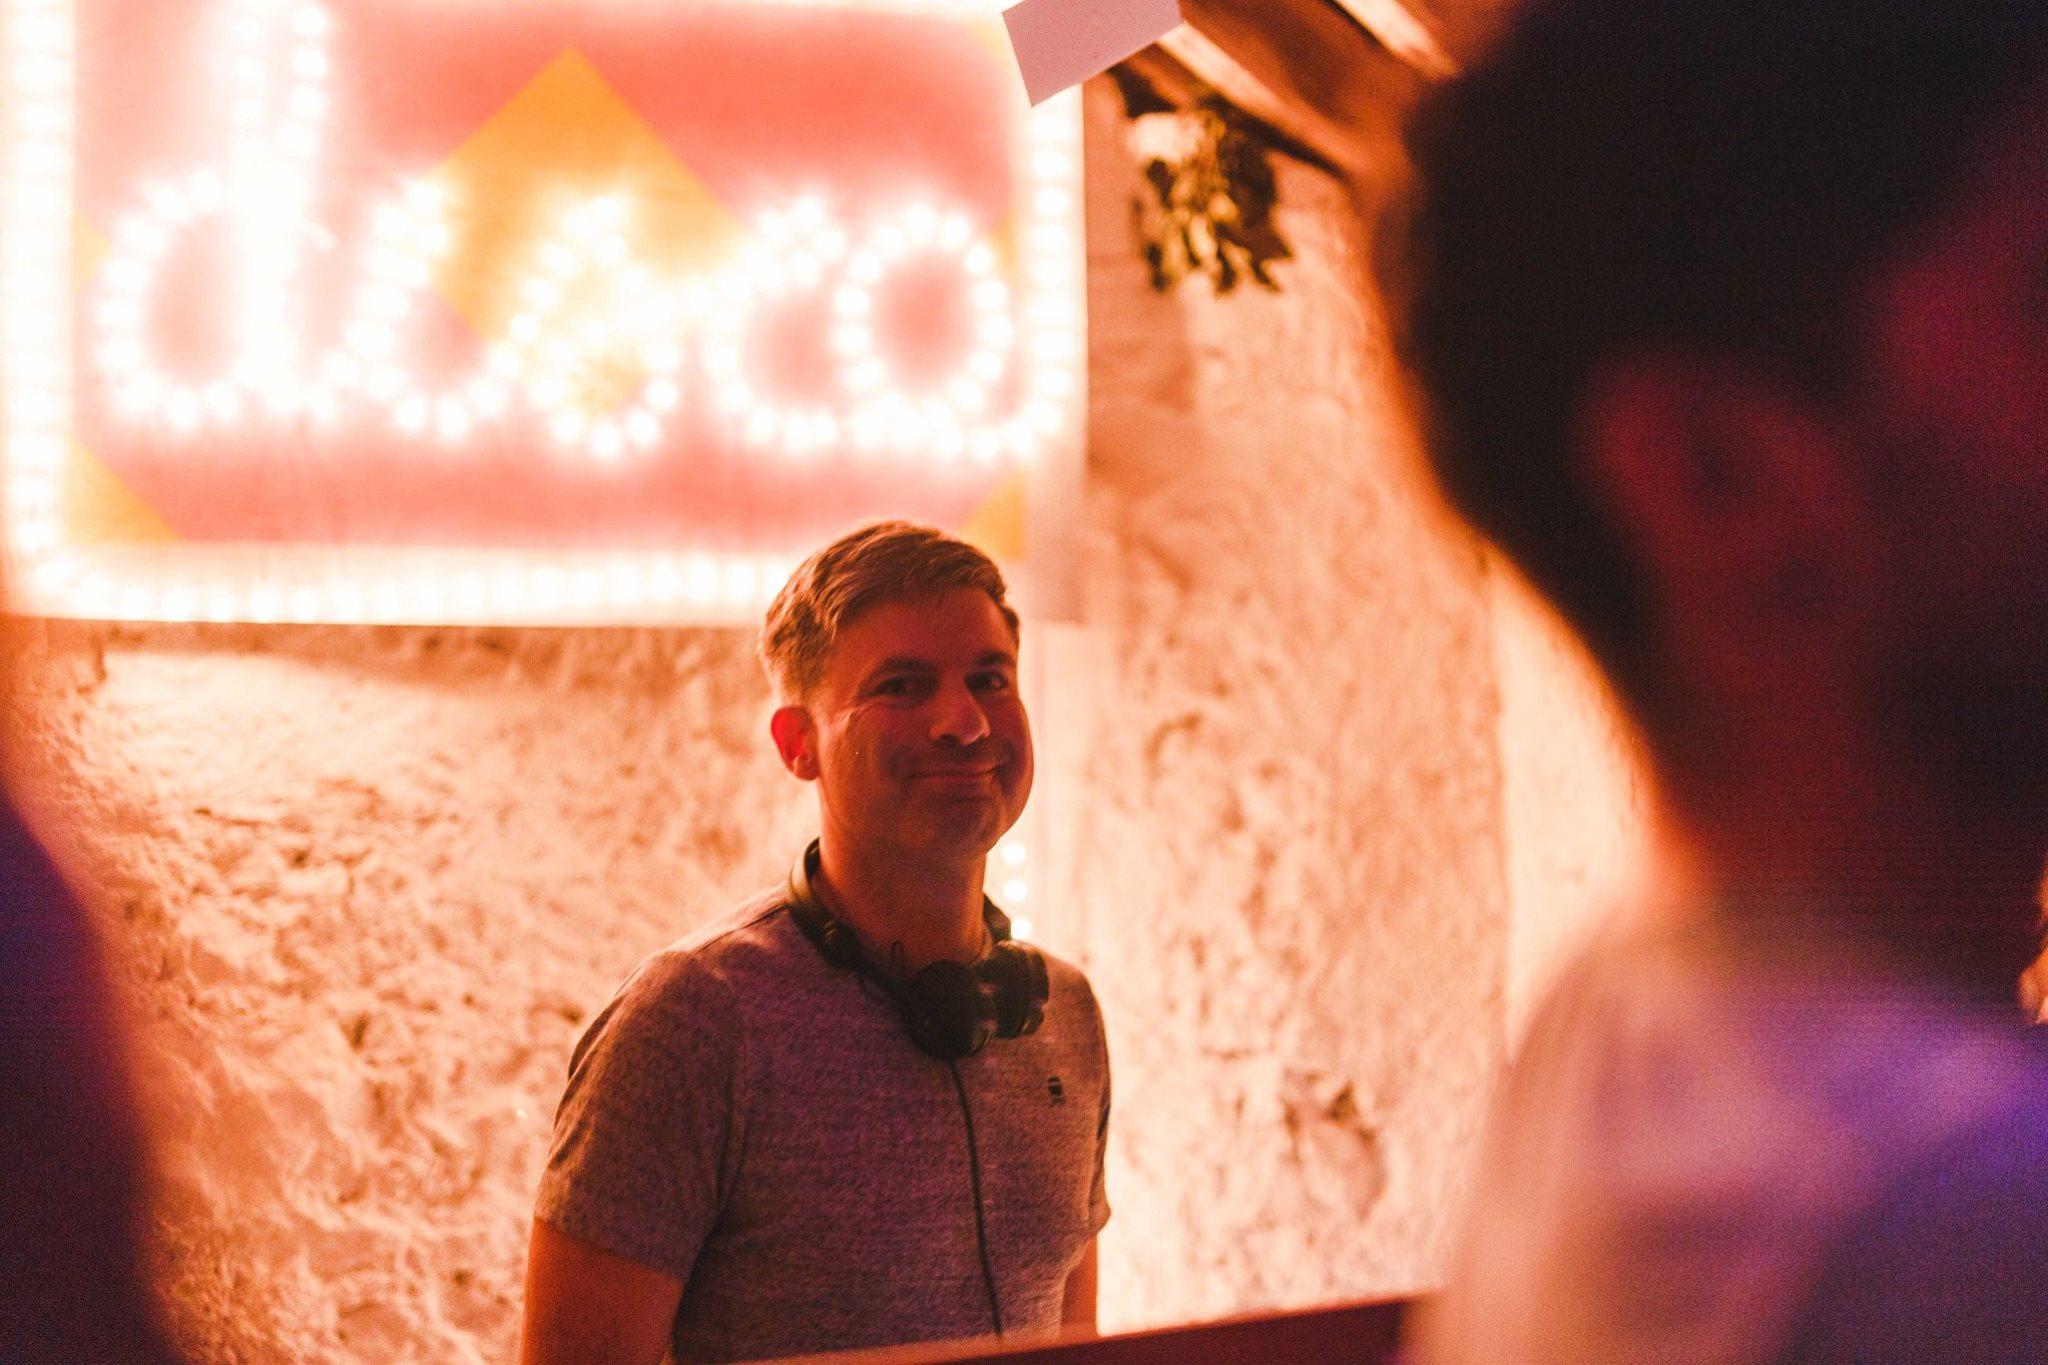 Cian O Ciobhain DJ Another Love Story